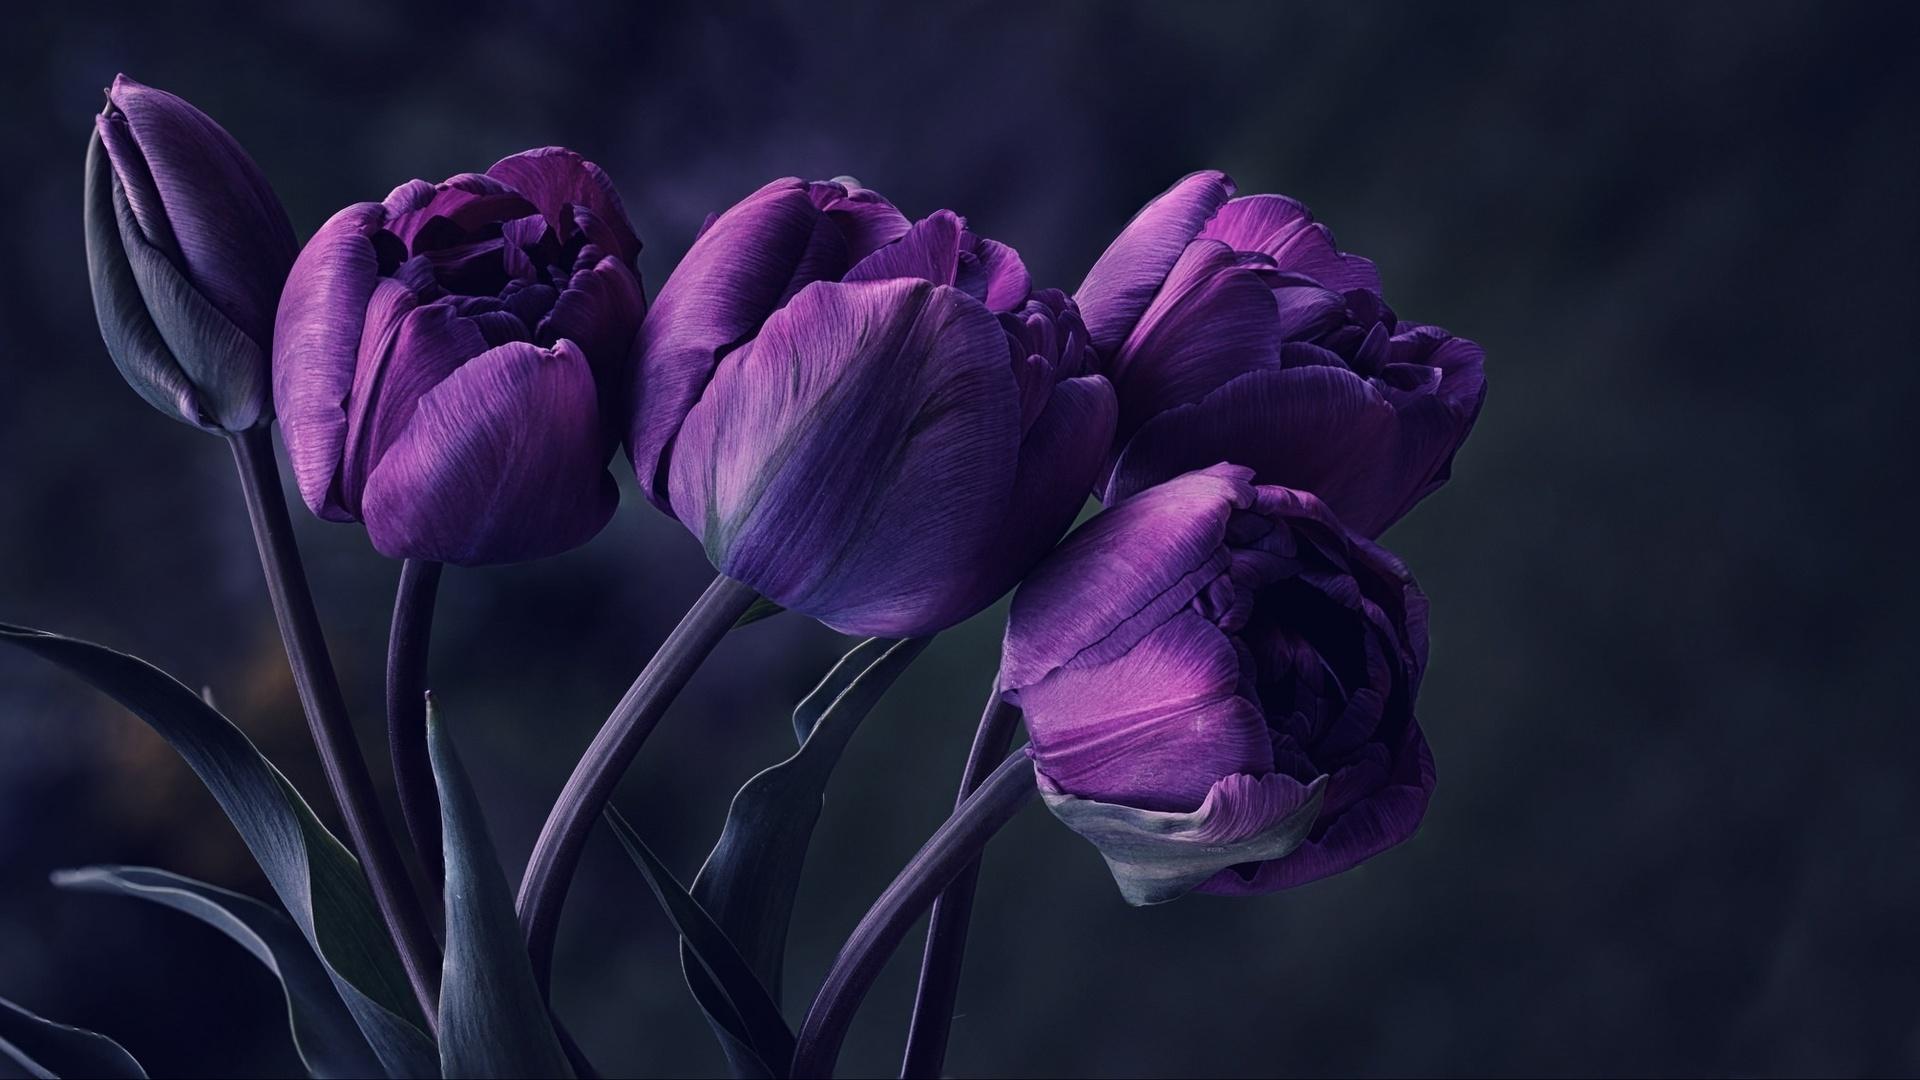 тюльпаны на темном фоне картинки знаковые